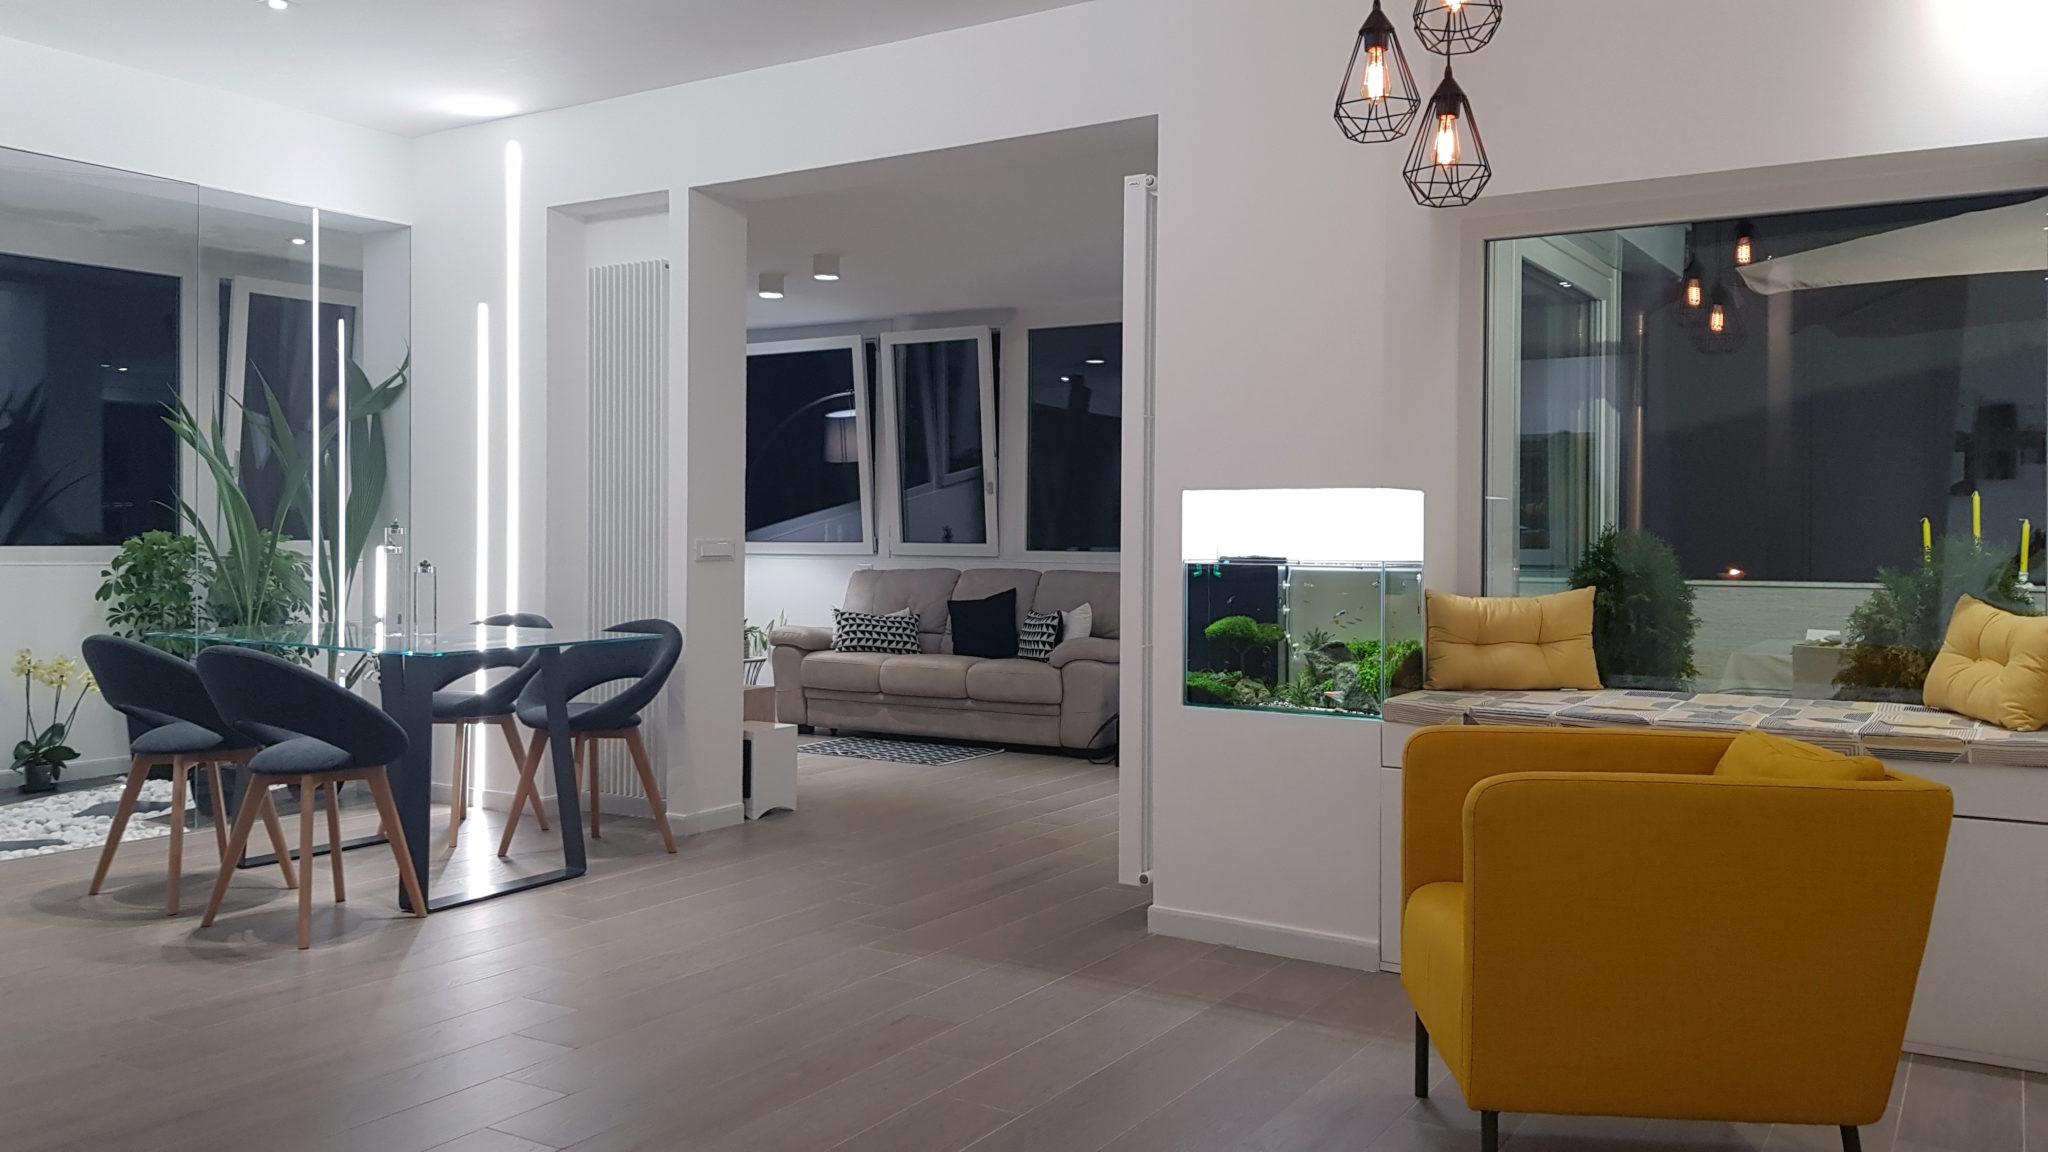 Casa ls un attico al nono piano garden house for Casa moderna 1 piano